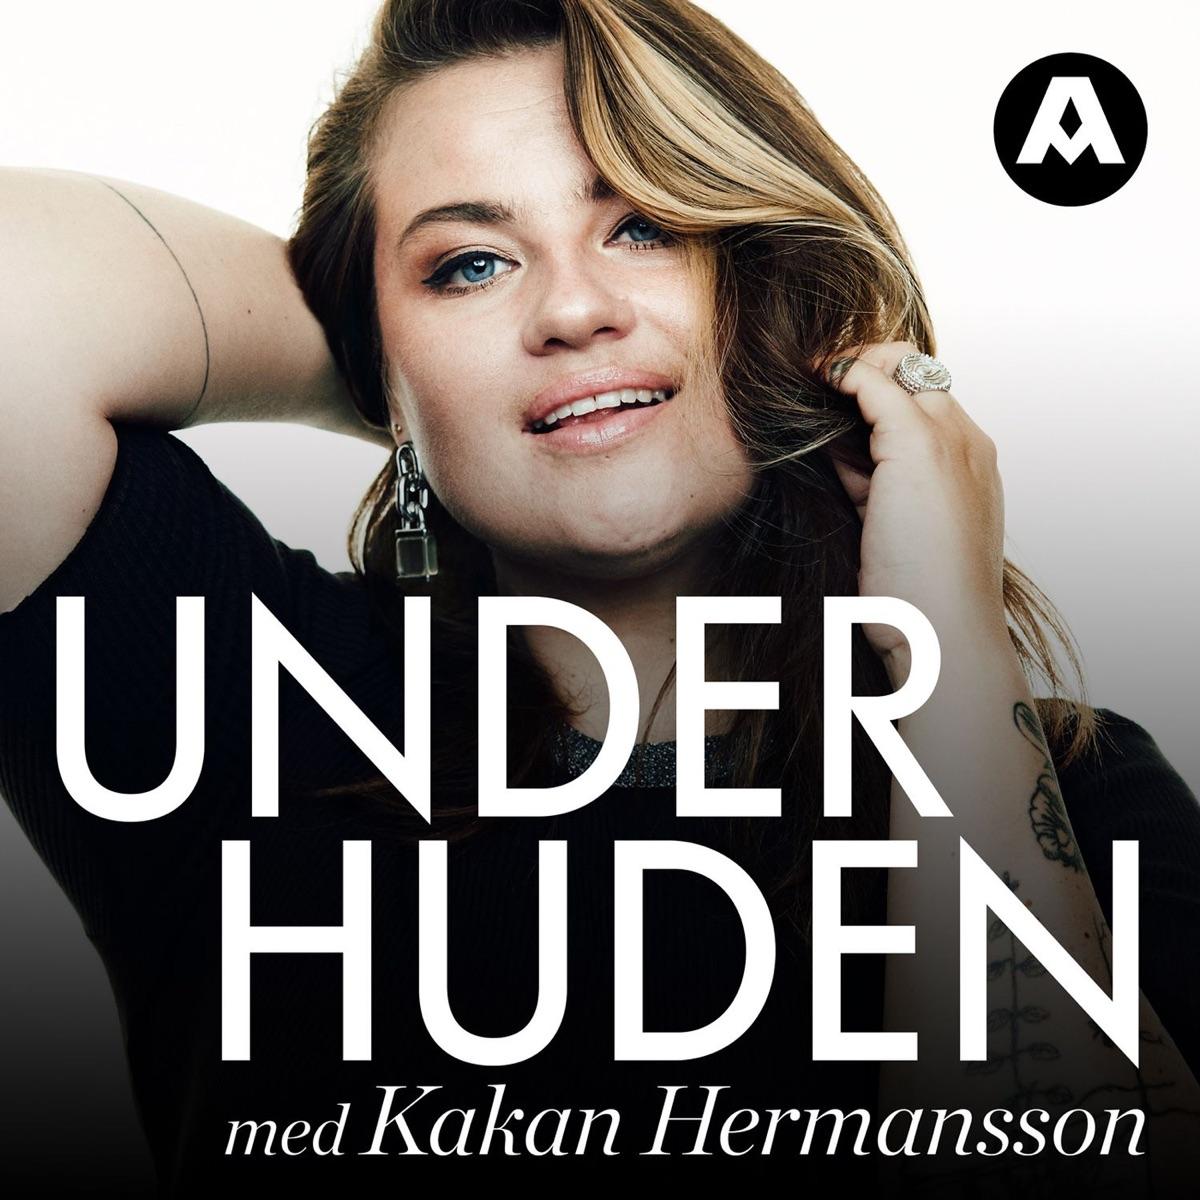 Under huden med Kakan Hermansson